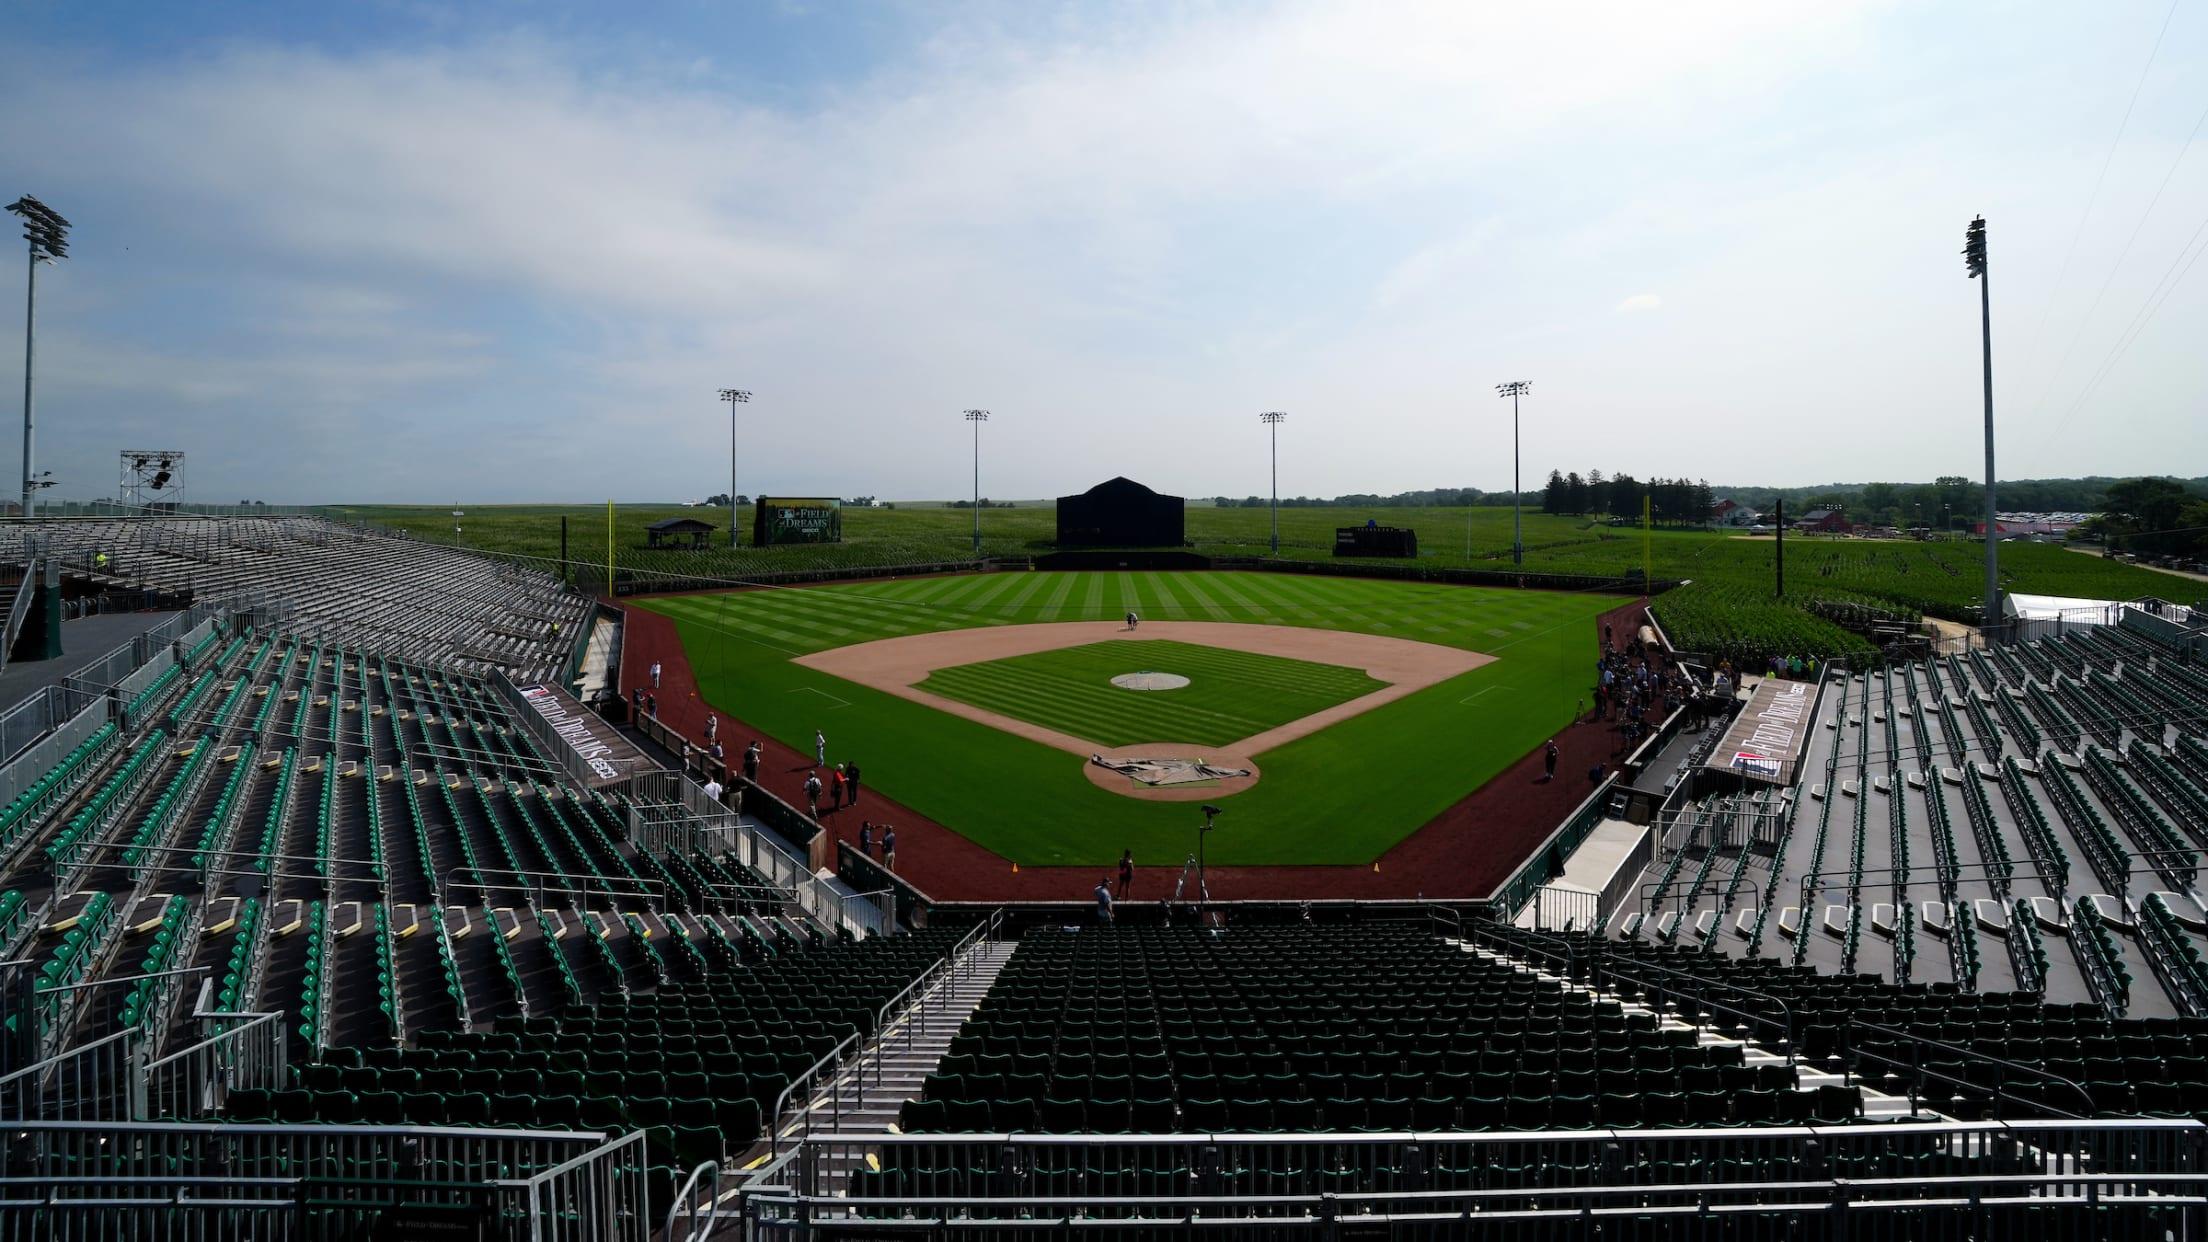 2568x1444 Field of Dreams ballpark view 20210811